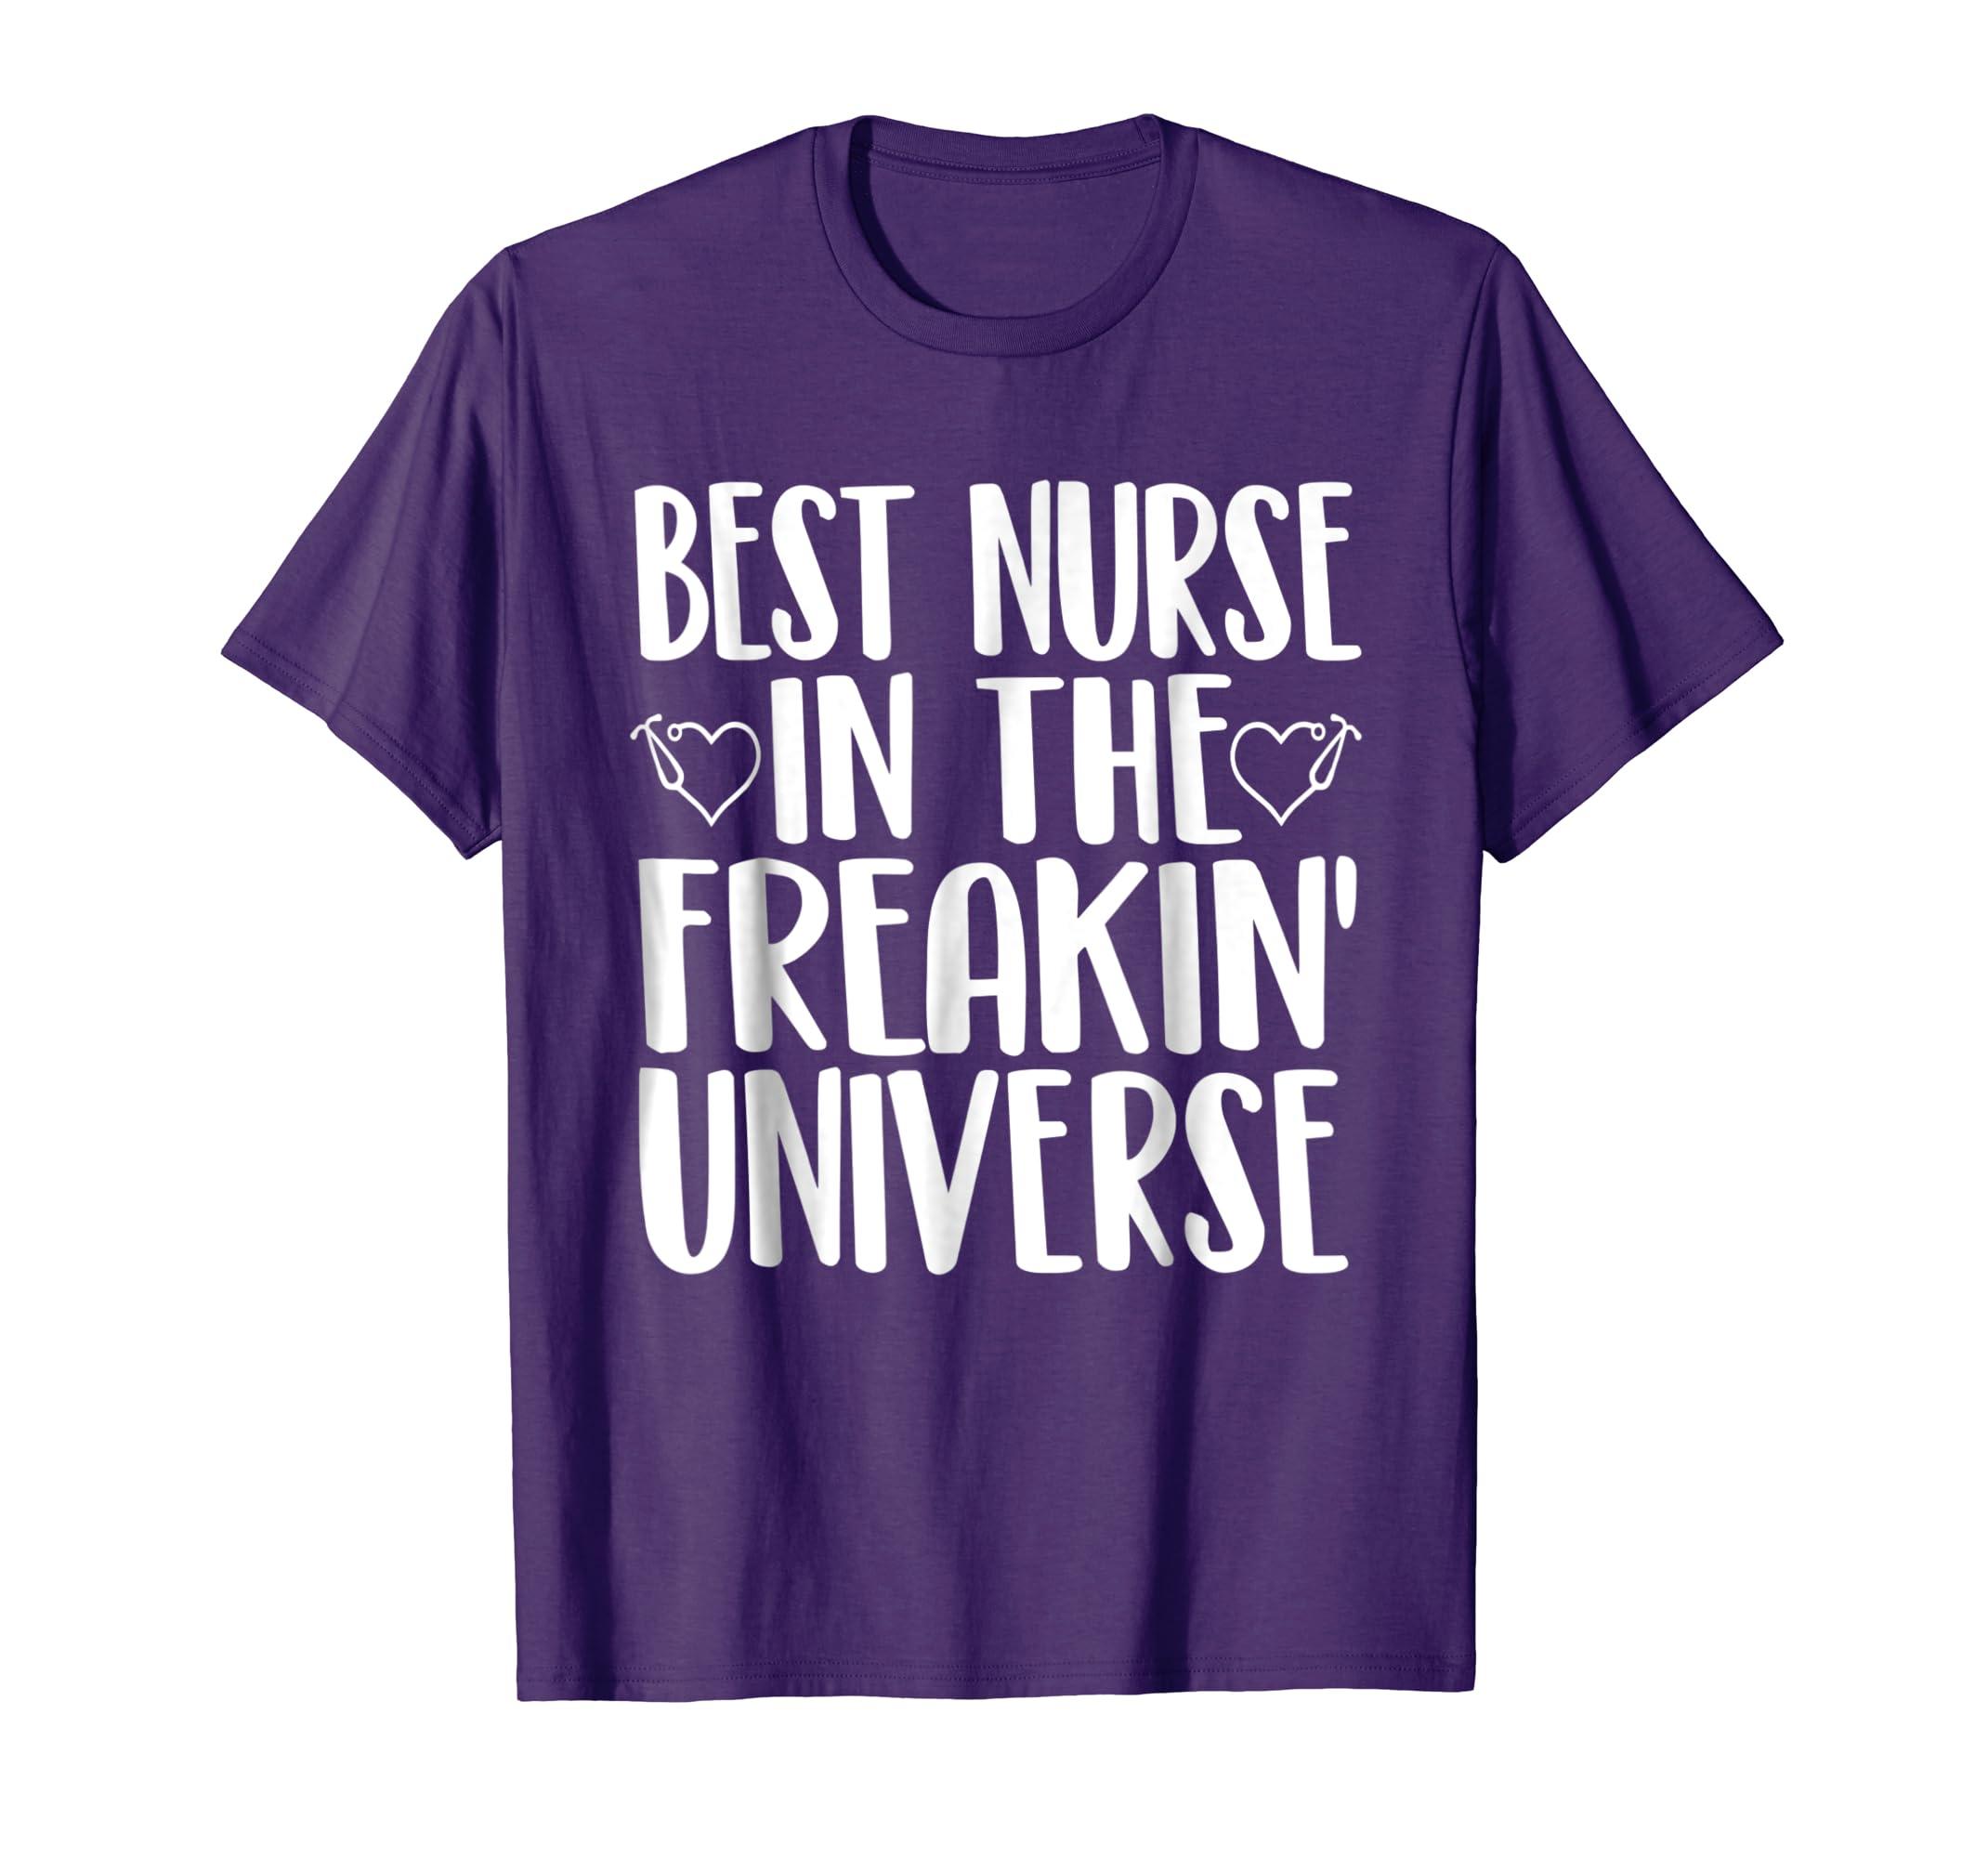 f45866d4aec5d Best Nursing Shirts On Amazon | Toffee Art